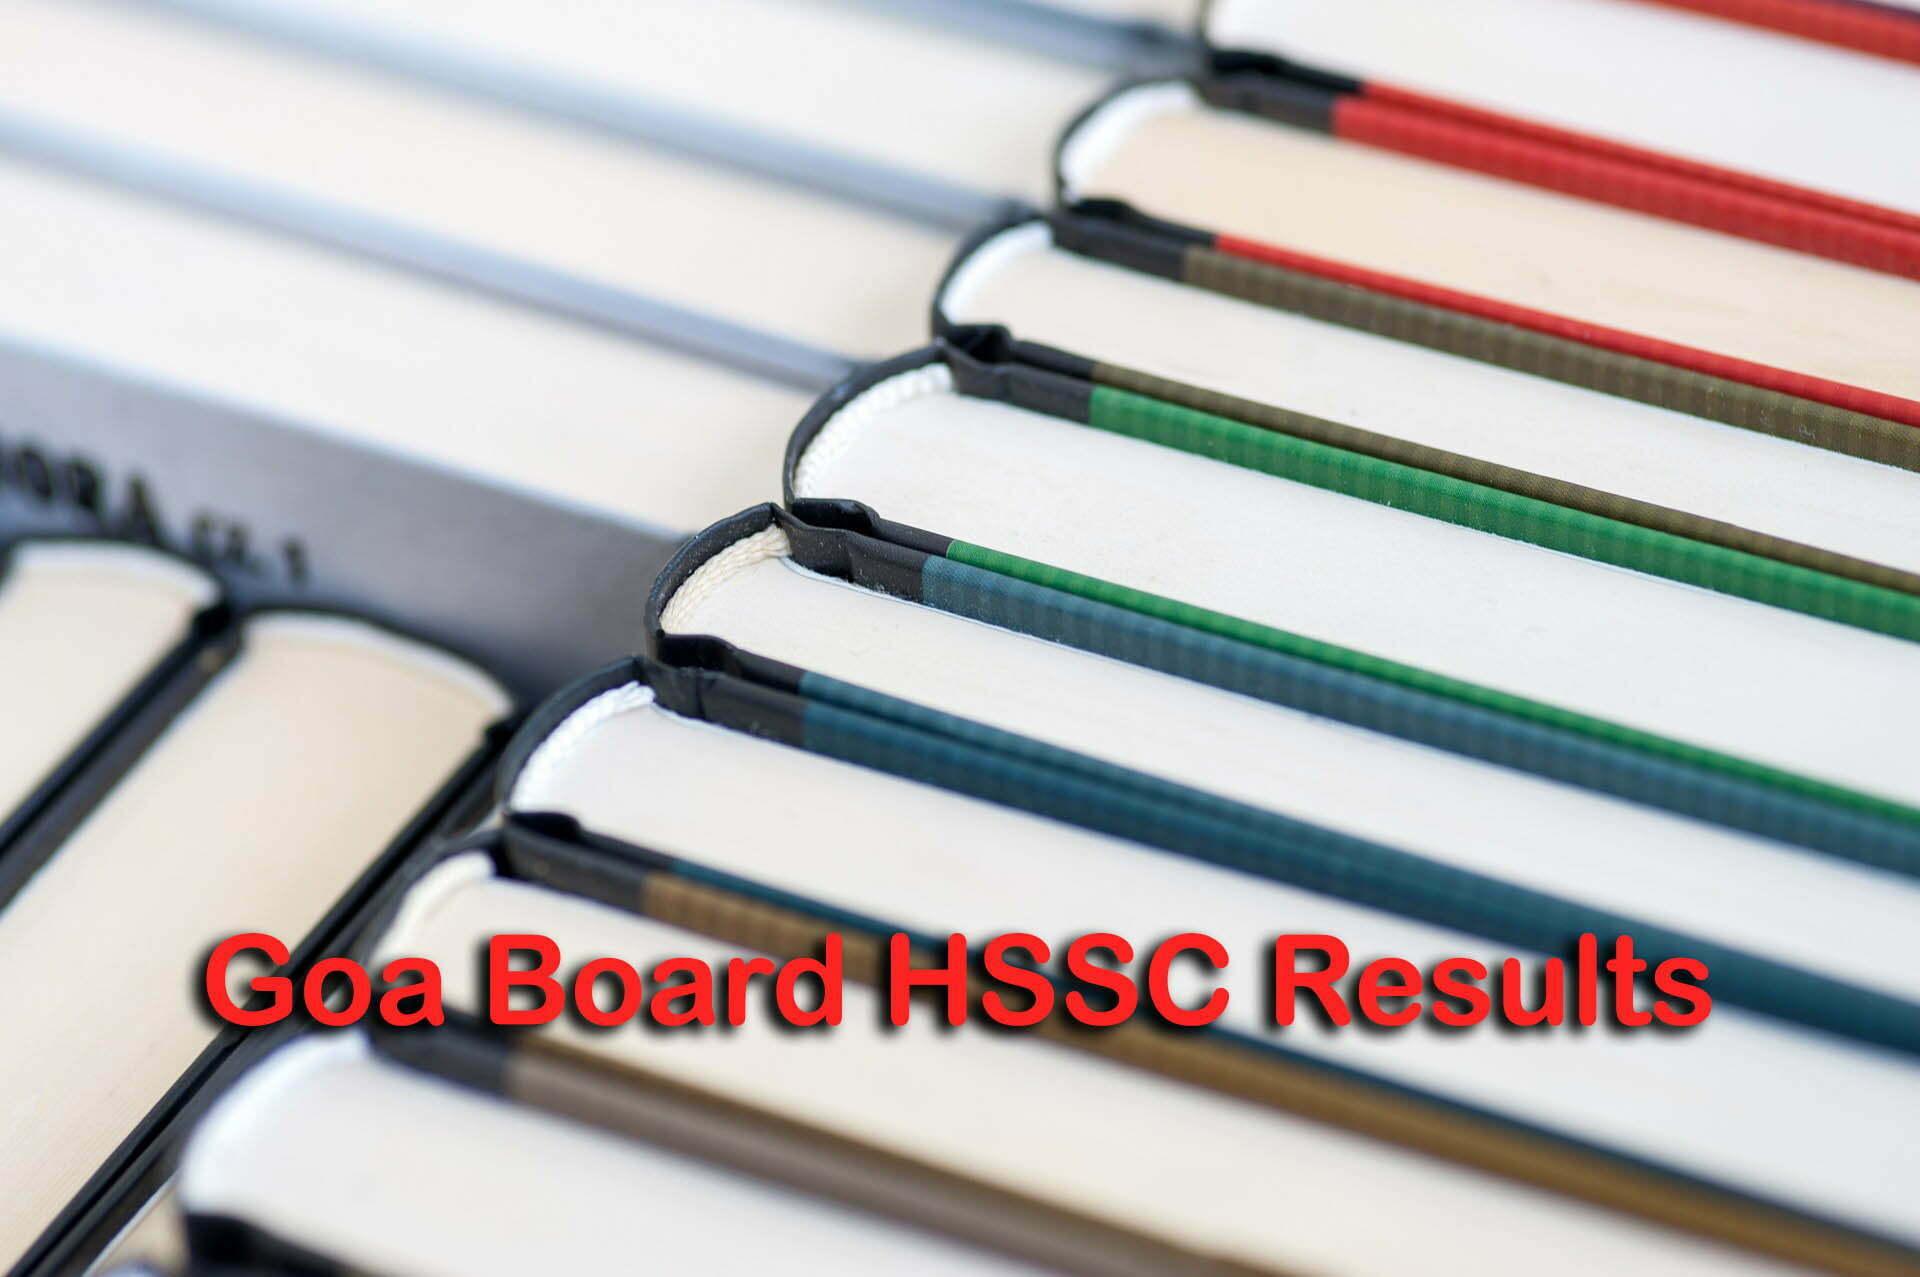 Goa Board HSSC Results